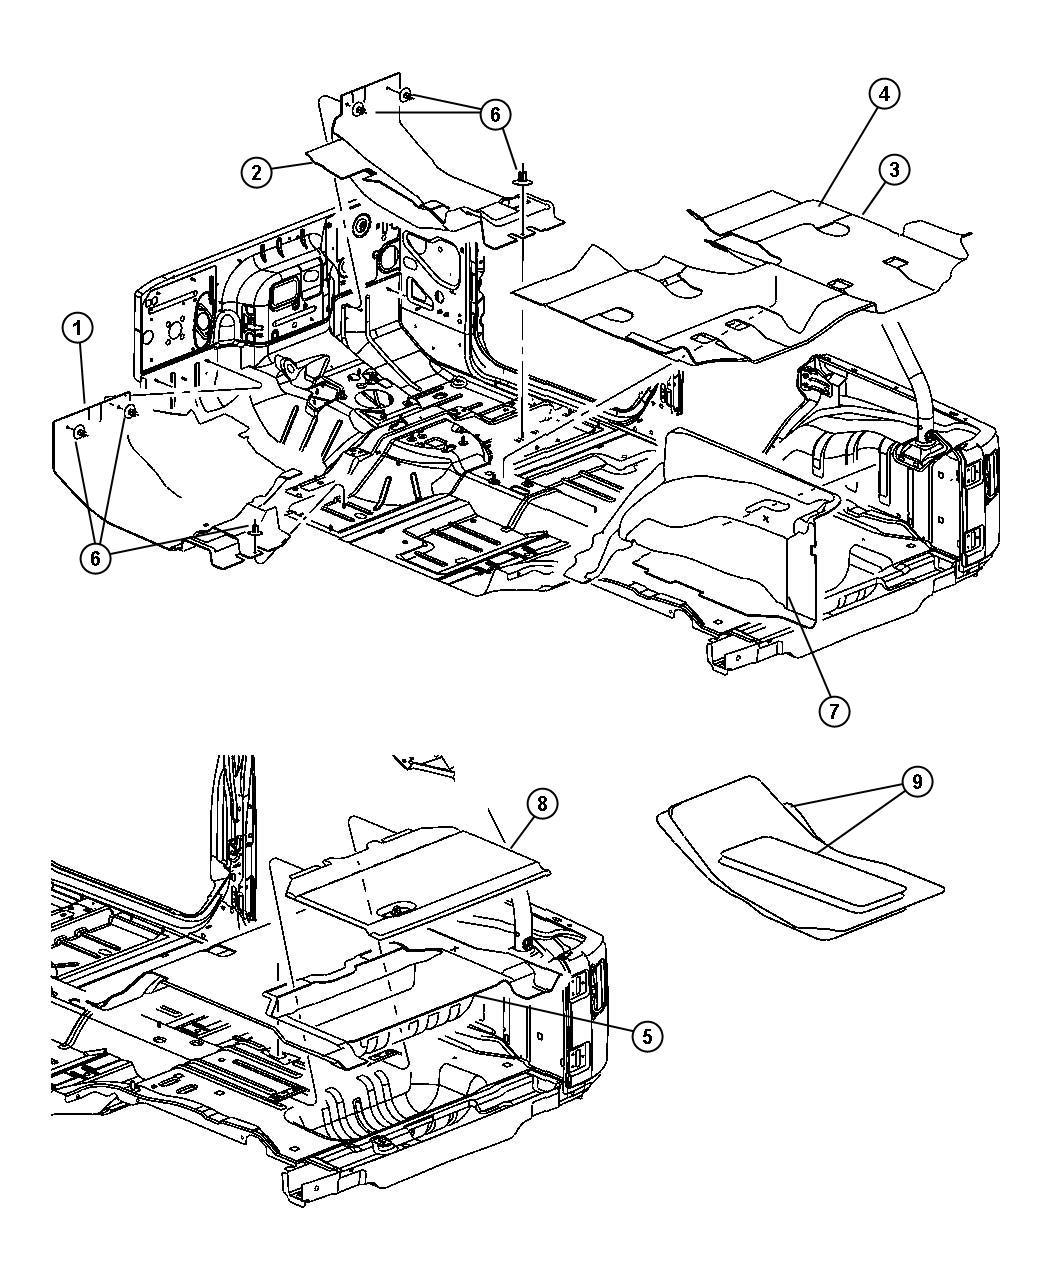 Jeep Wrangler Carpet Cargo Floor Rear Seat Wheelhouse